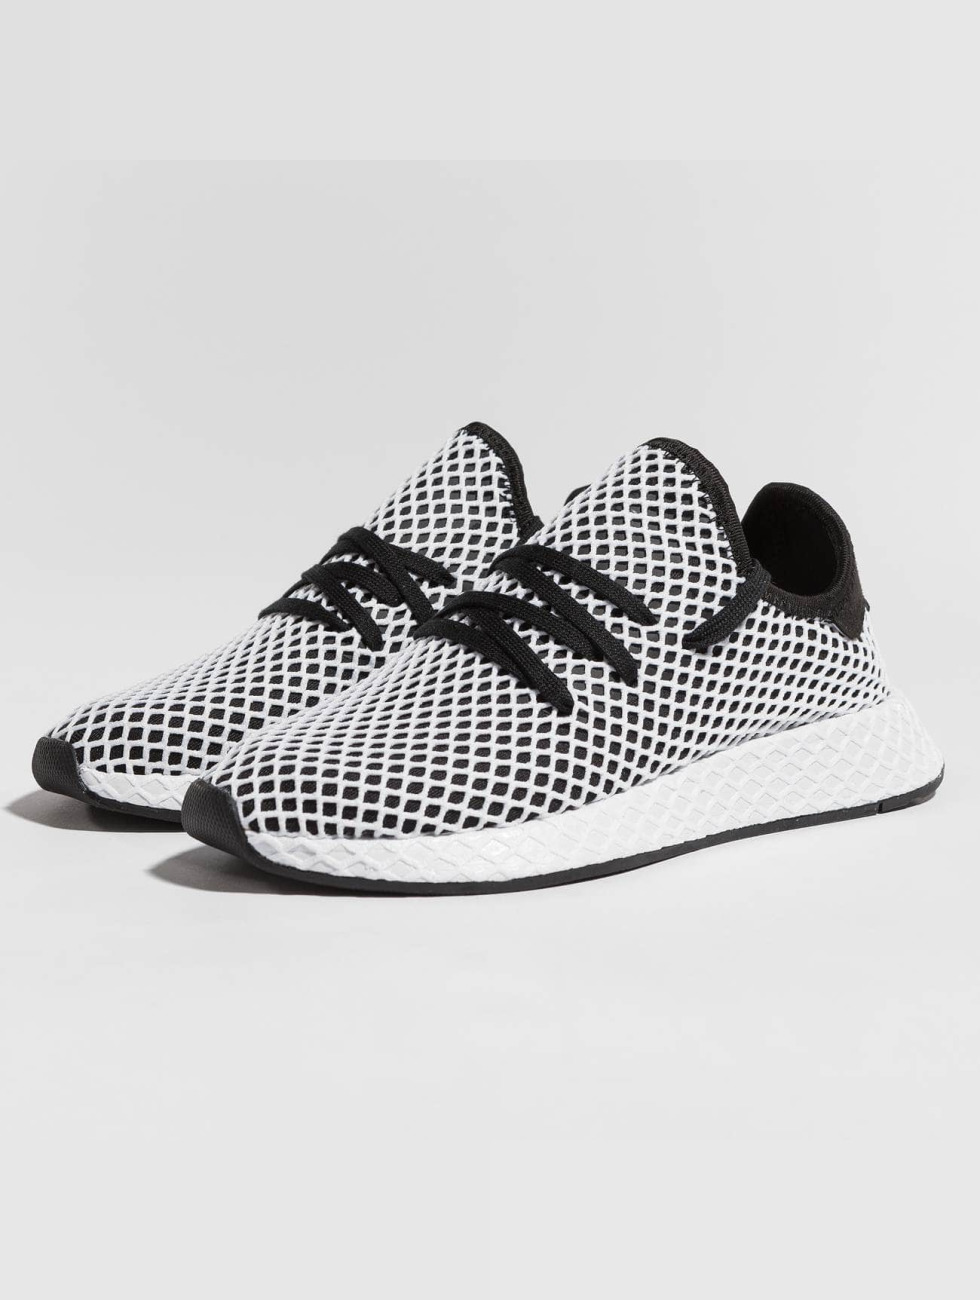 Adidas Originals Scarpa / Sneaker Corridore Deerupt In Nero 437 508 XXOV2pTXb0